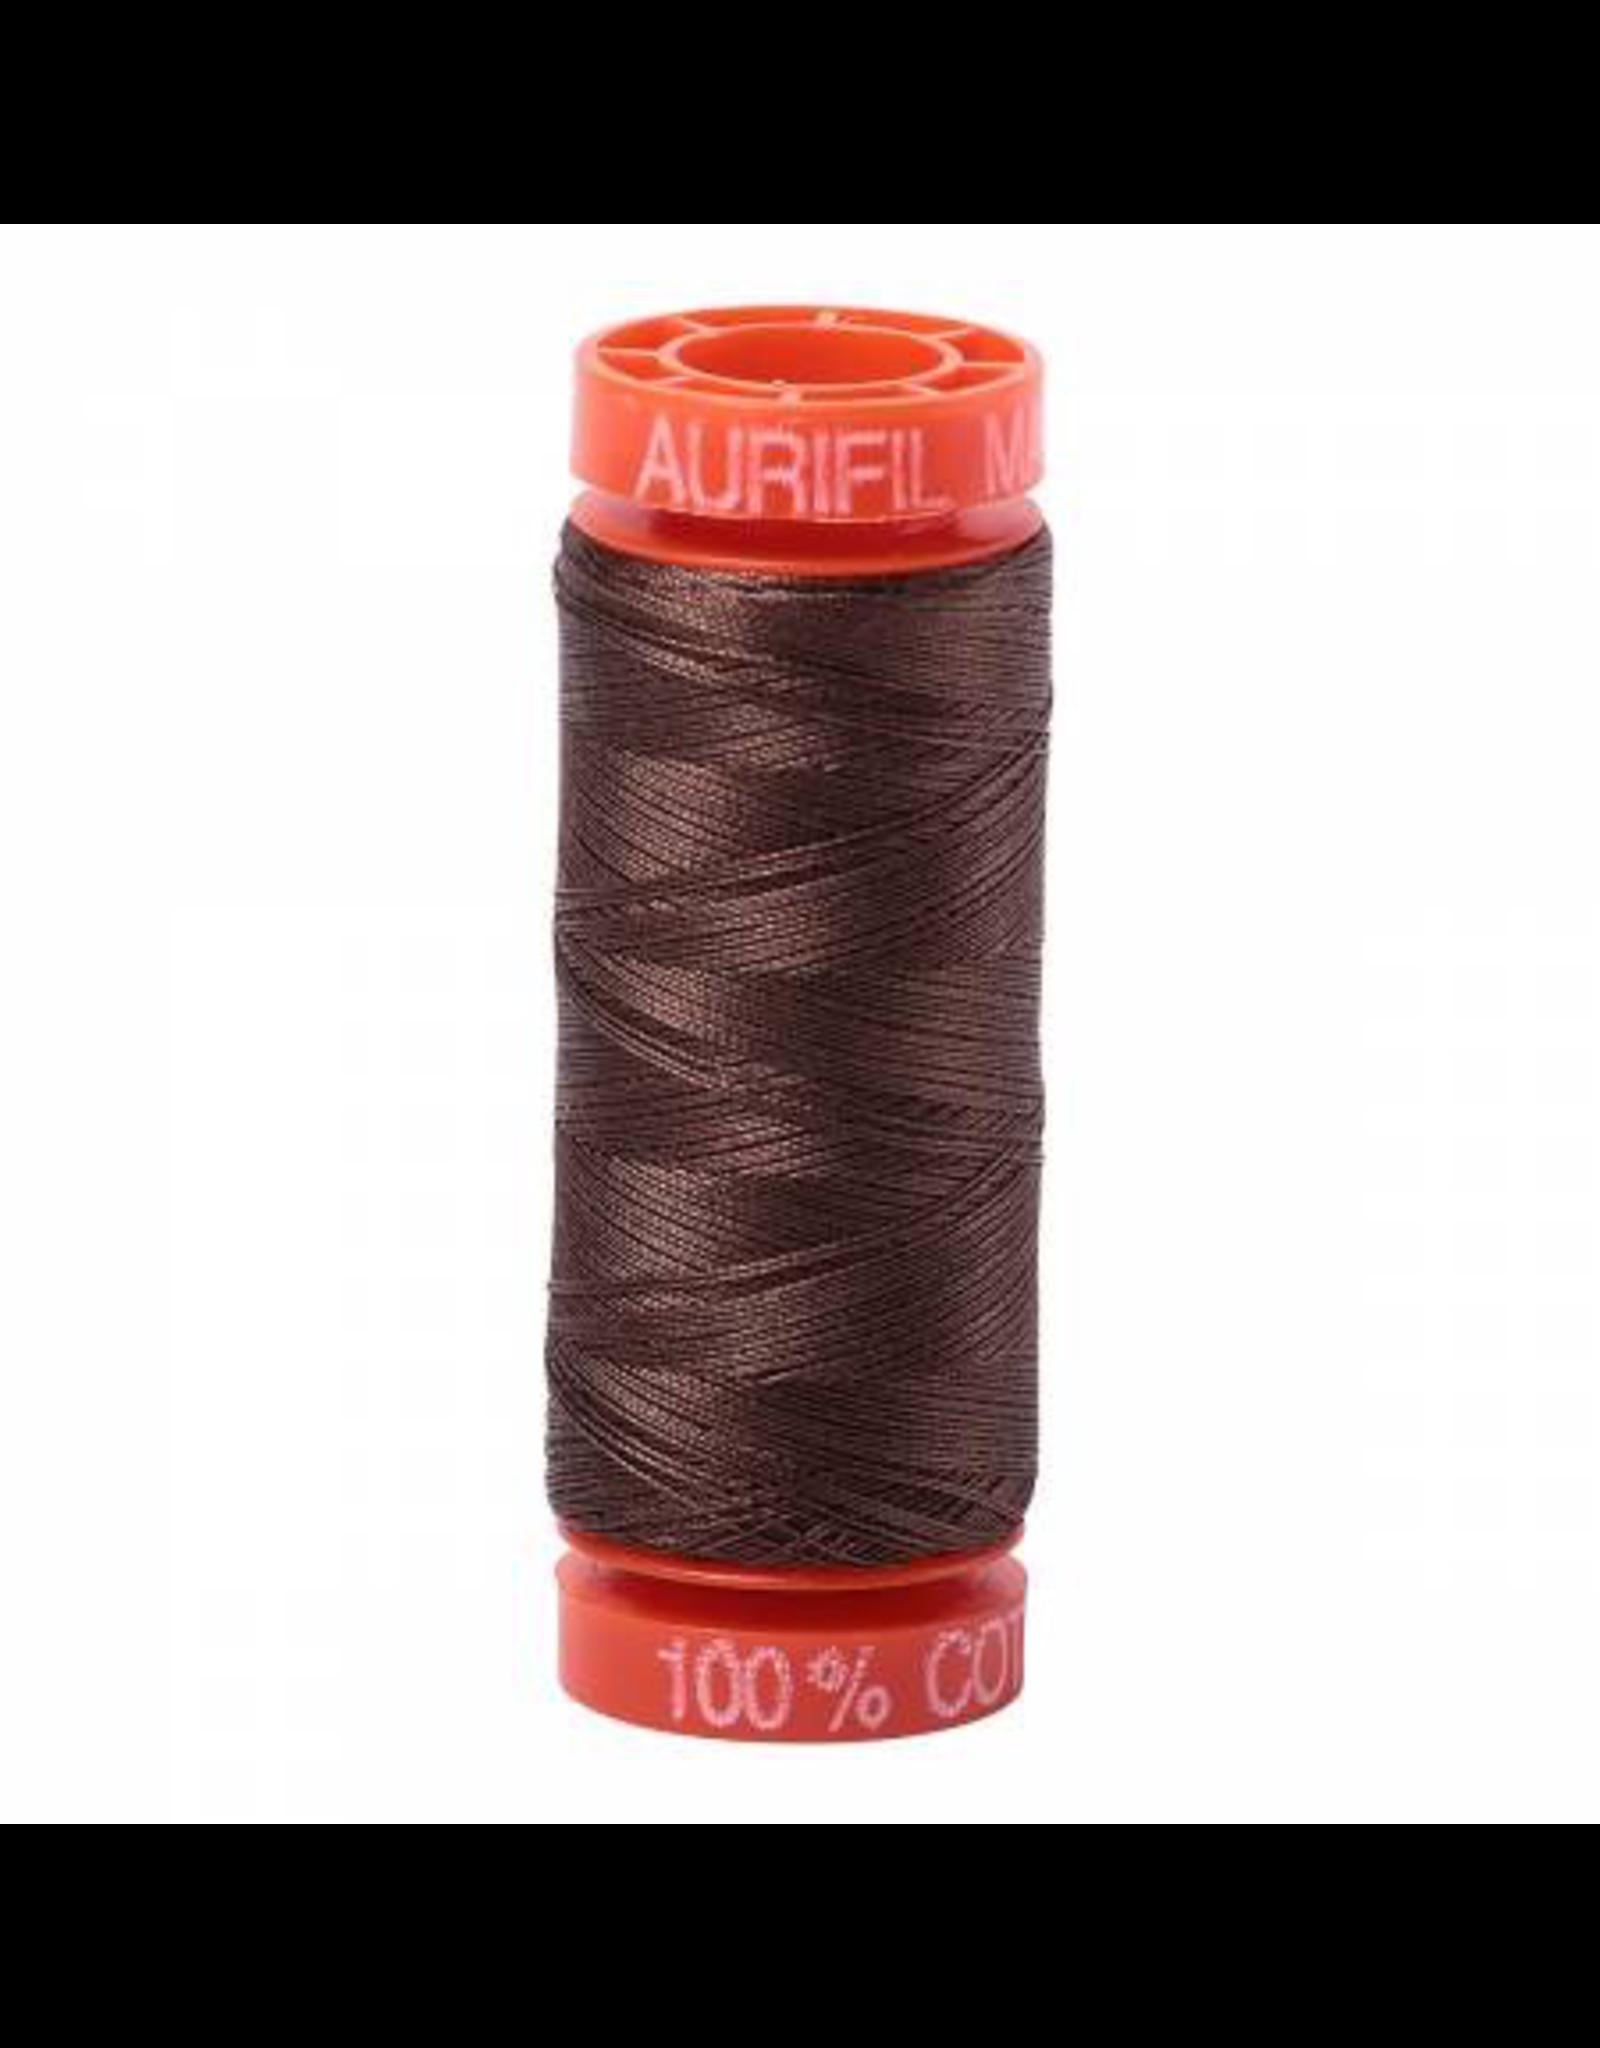 Aurifil Cotton Thread 50 wt 220 yd Bark